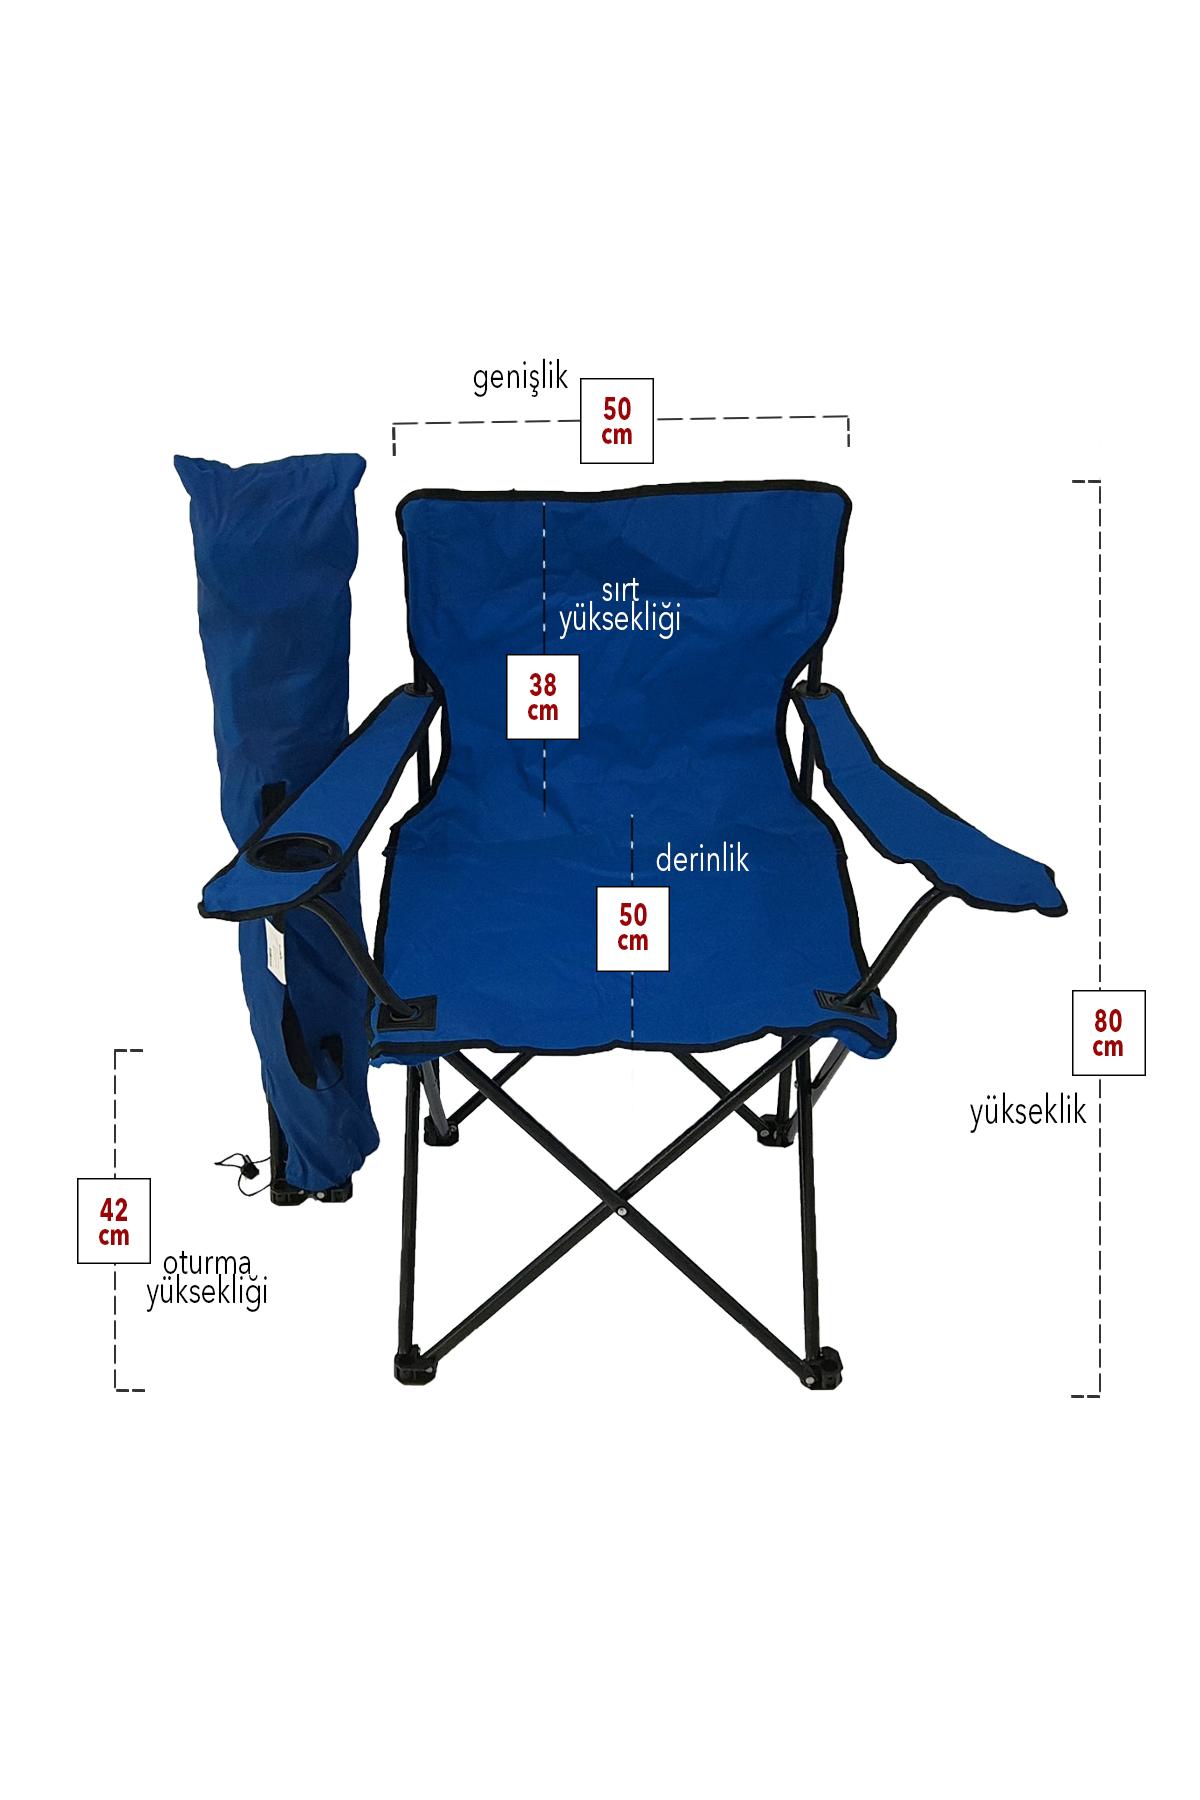 Bofigo 3-Seat Camping Chair Picnic Chair Folding Chair Camping Chair with Carrying Bag Blue